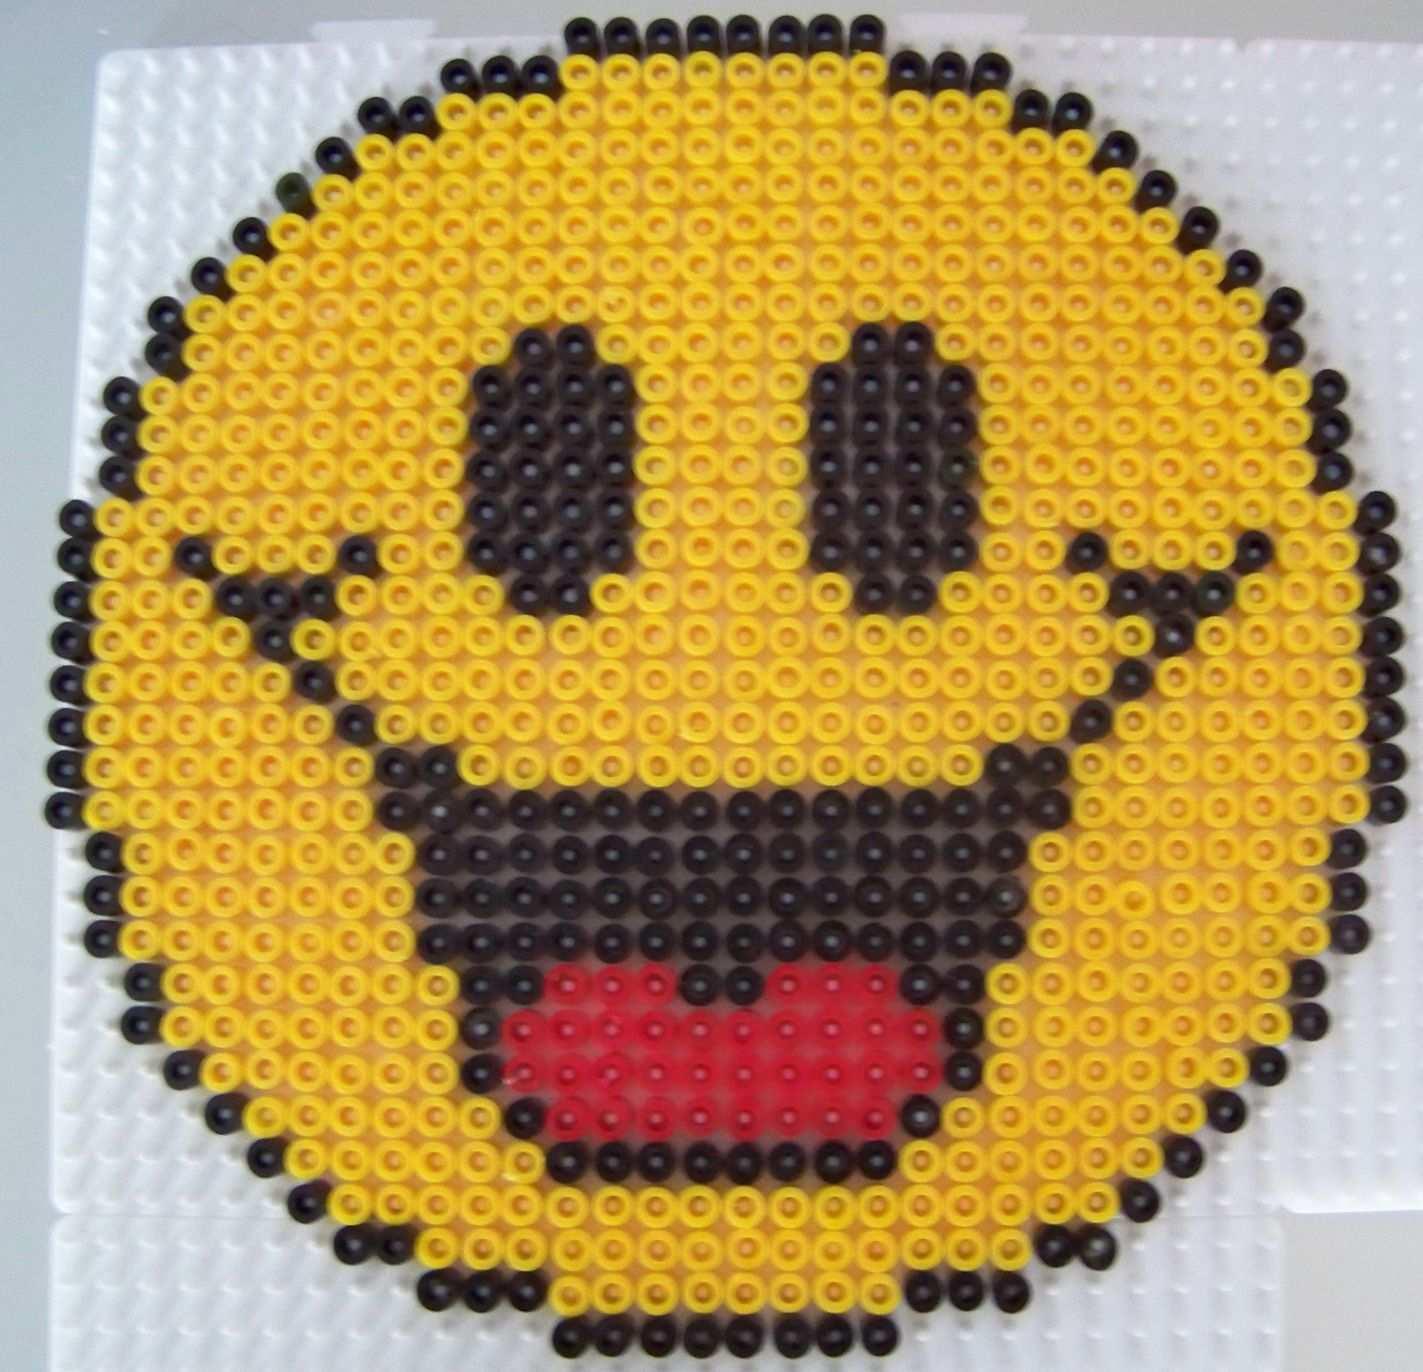 Smiley Rire En Perles Hama Perler Bead Art Perler Bead Patterns Hama Beads Patterns